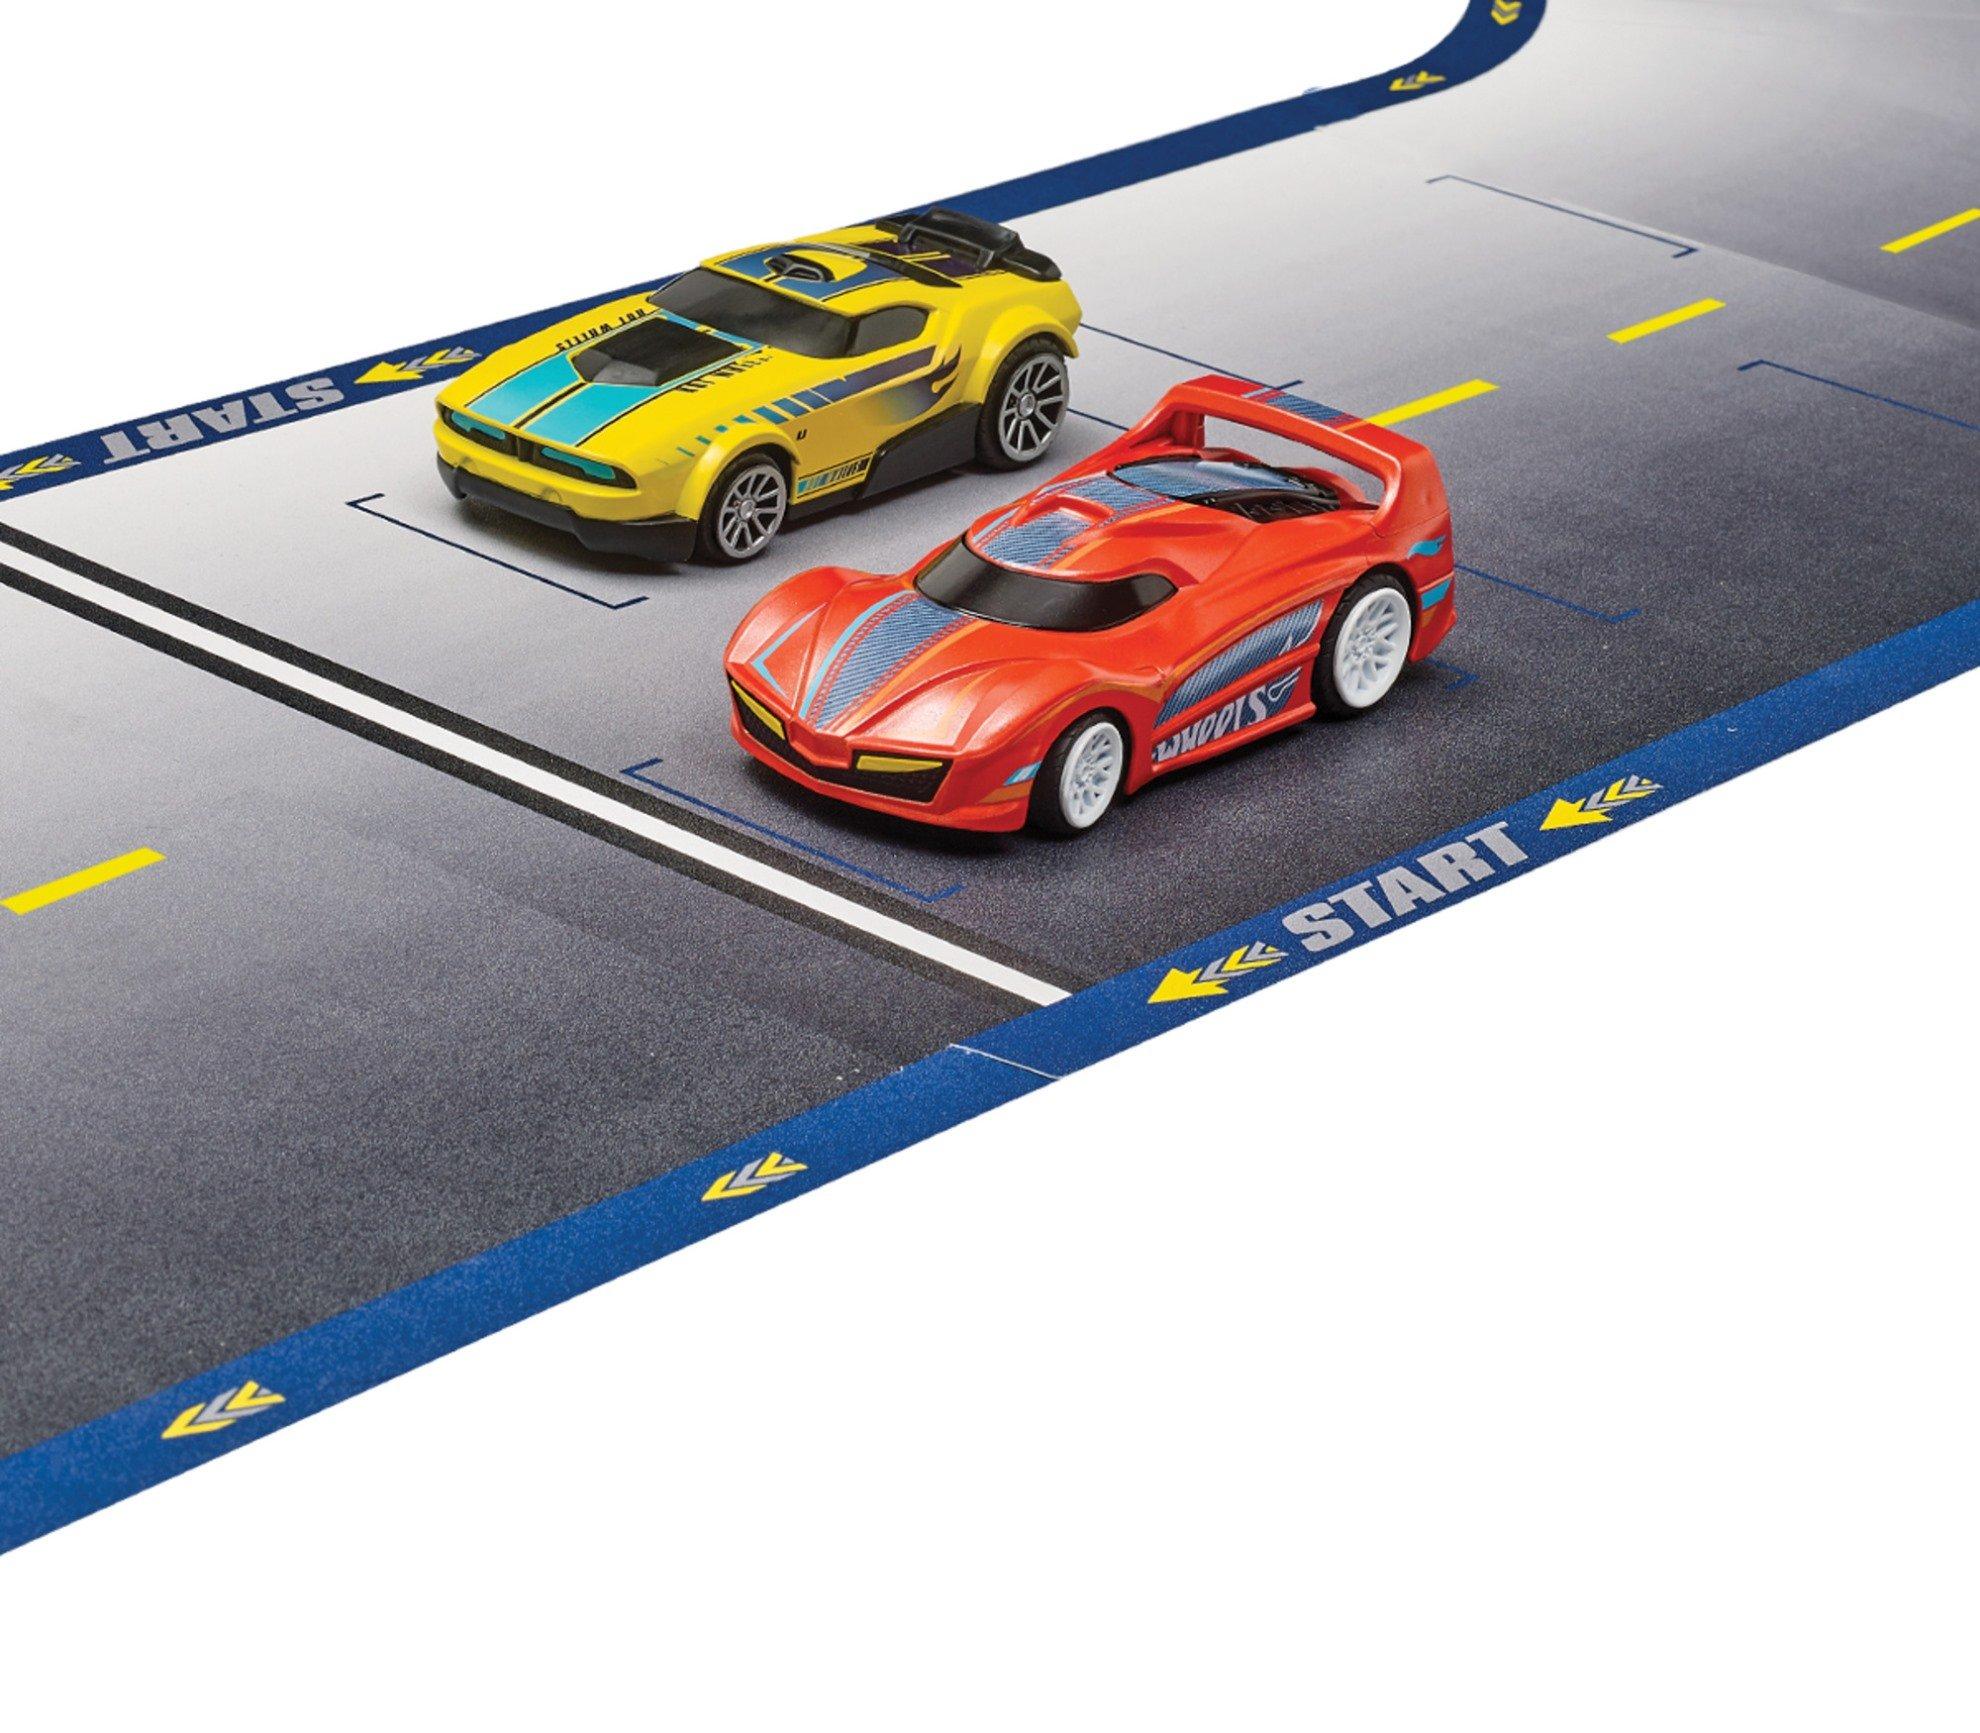 Hot Wheels Ai Starter Set Street Racing Edition by Hot Wheels (Image #6)